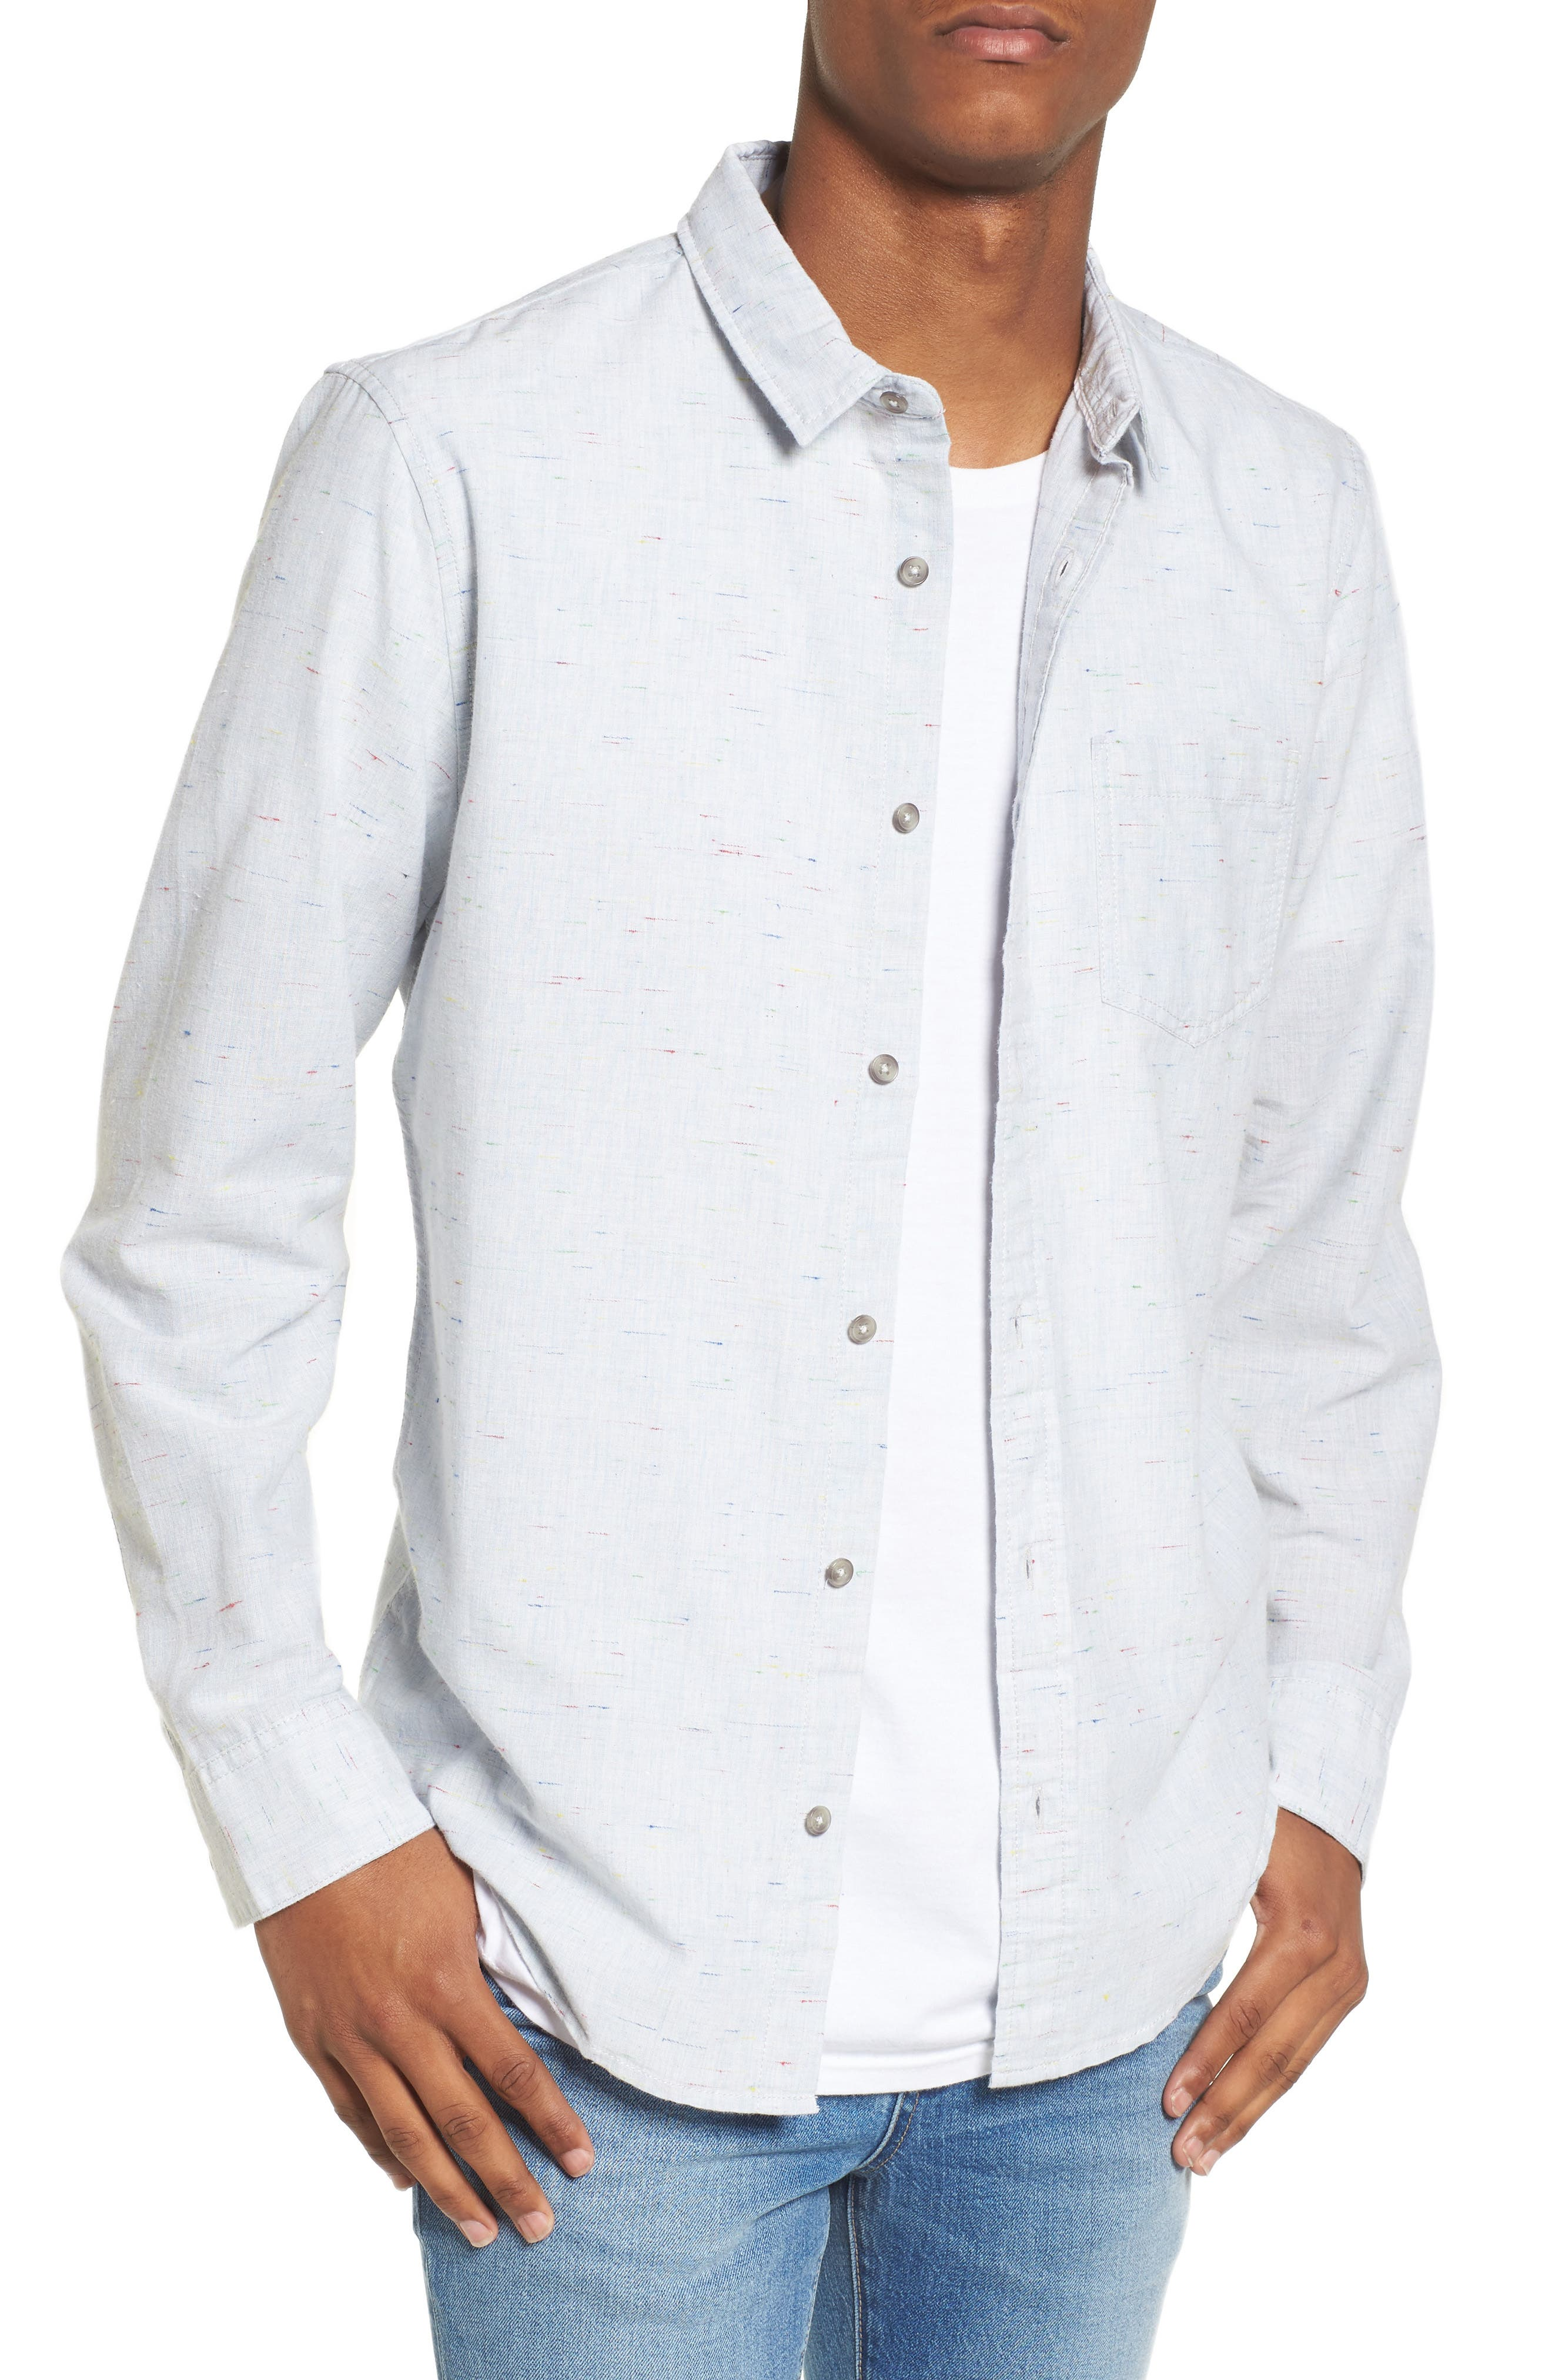 The Rail Long Sleeve Color Nep Shirt